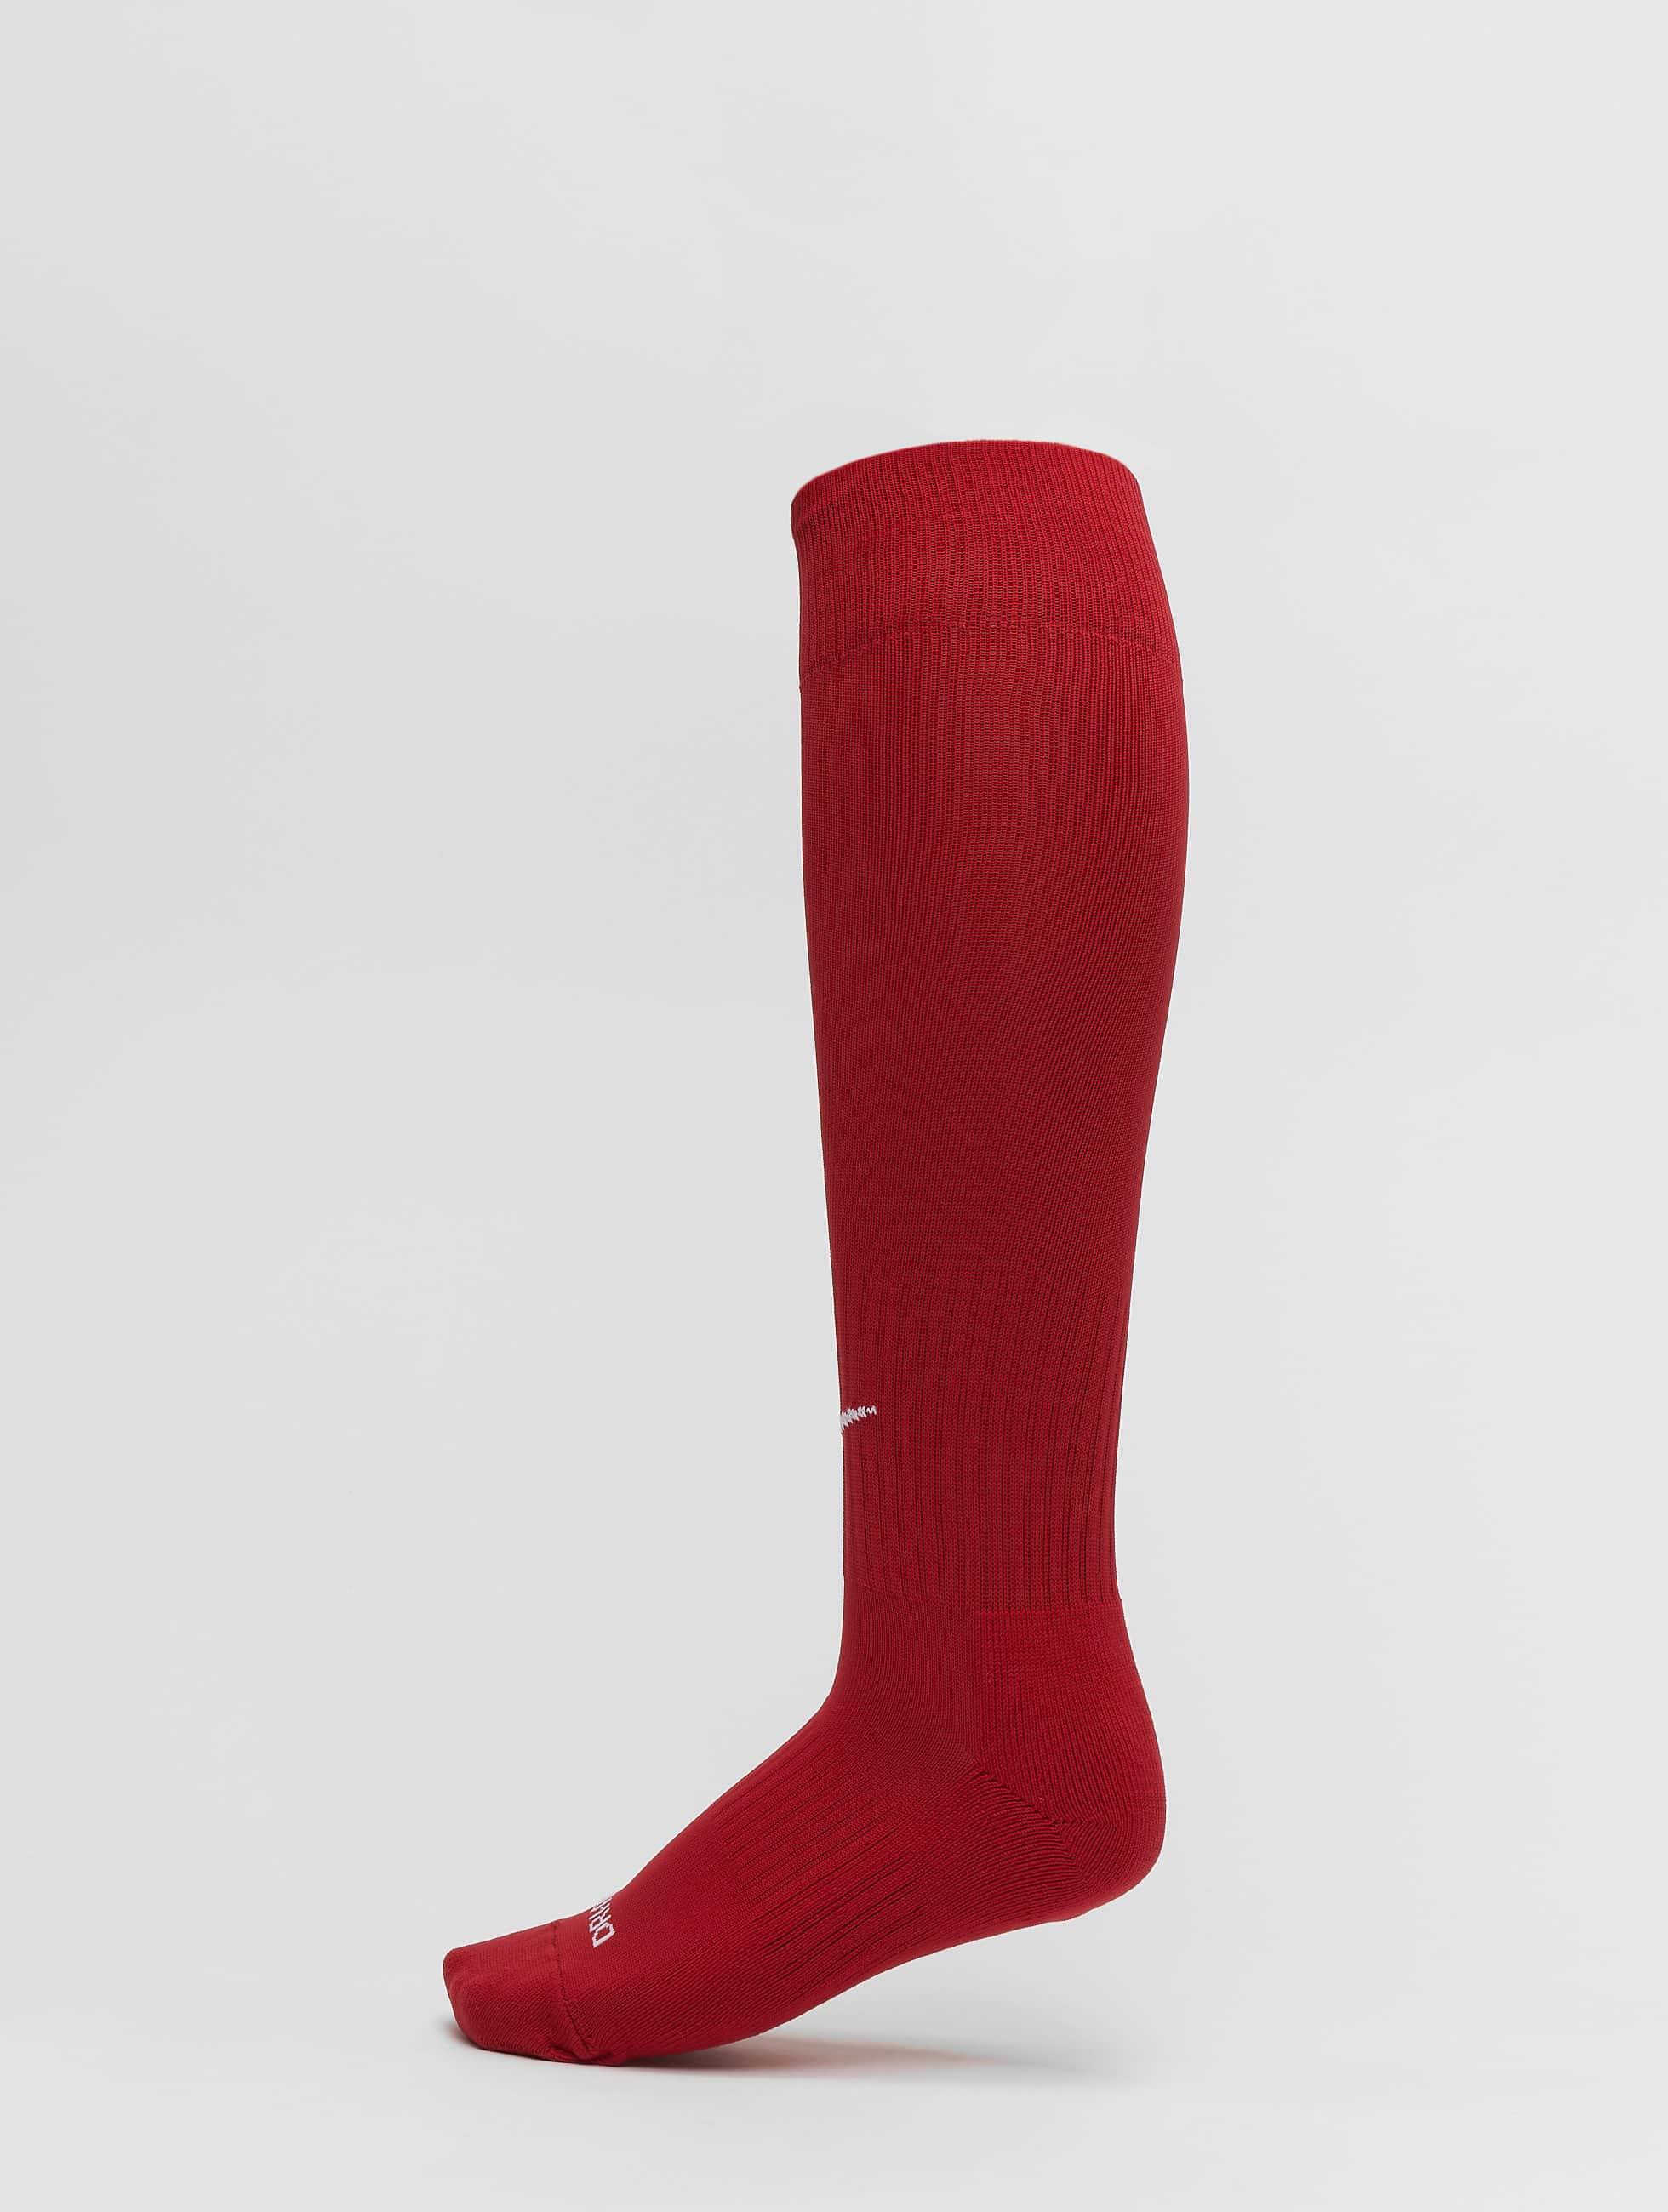 Nike Academy Over The Calf Football Socks Varsity RedWhite